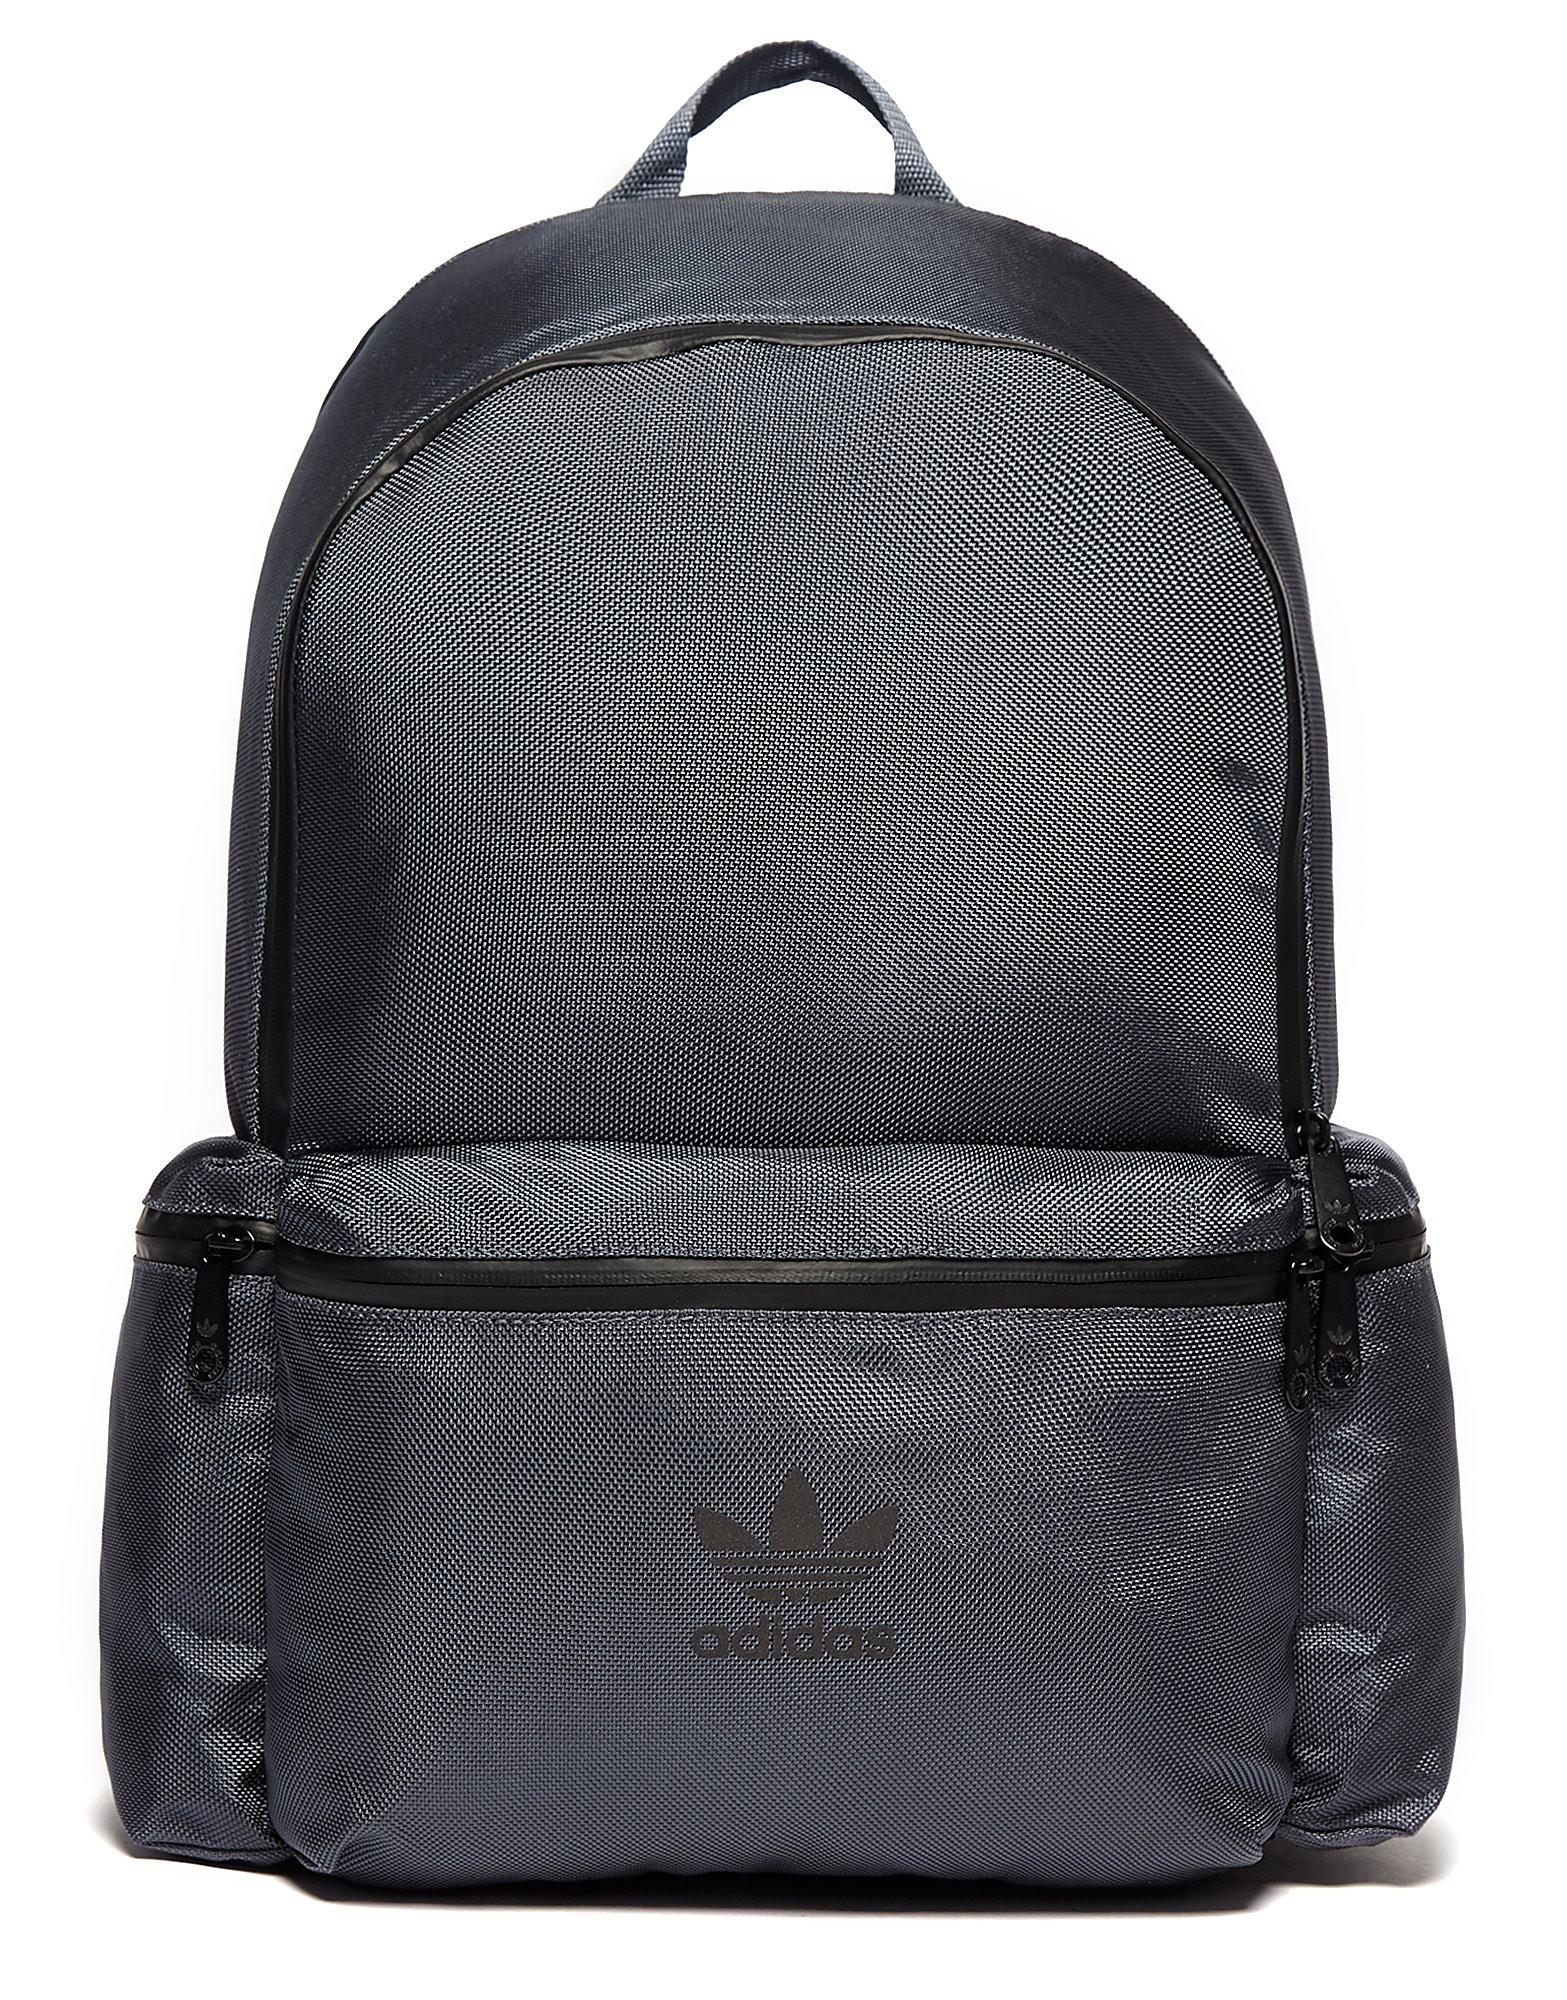 adidas Originals Three Pocket Backpack